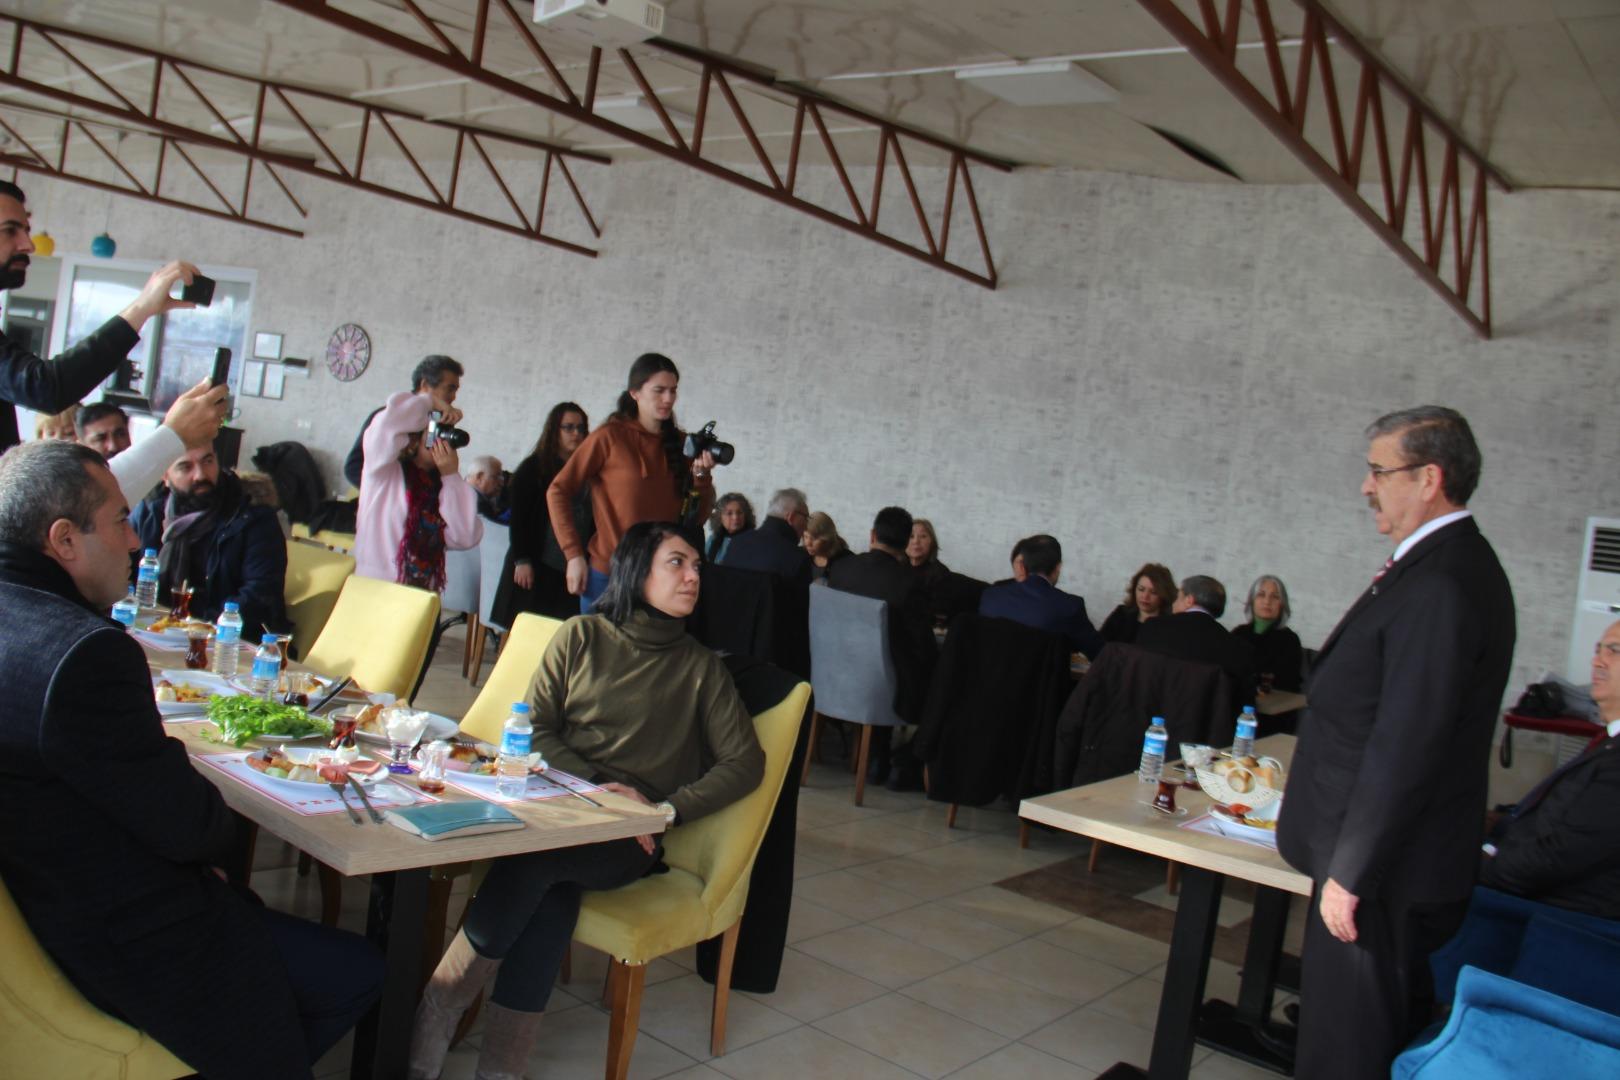 CHP'DEN GAZETECİLERE ÖZEL KAHVALTI